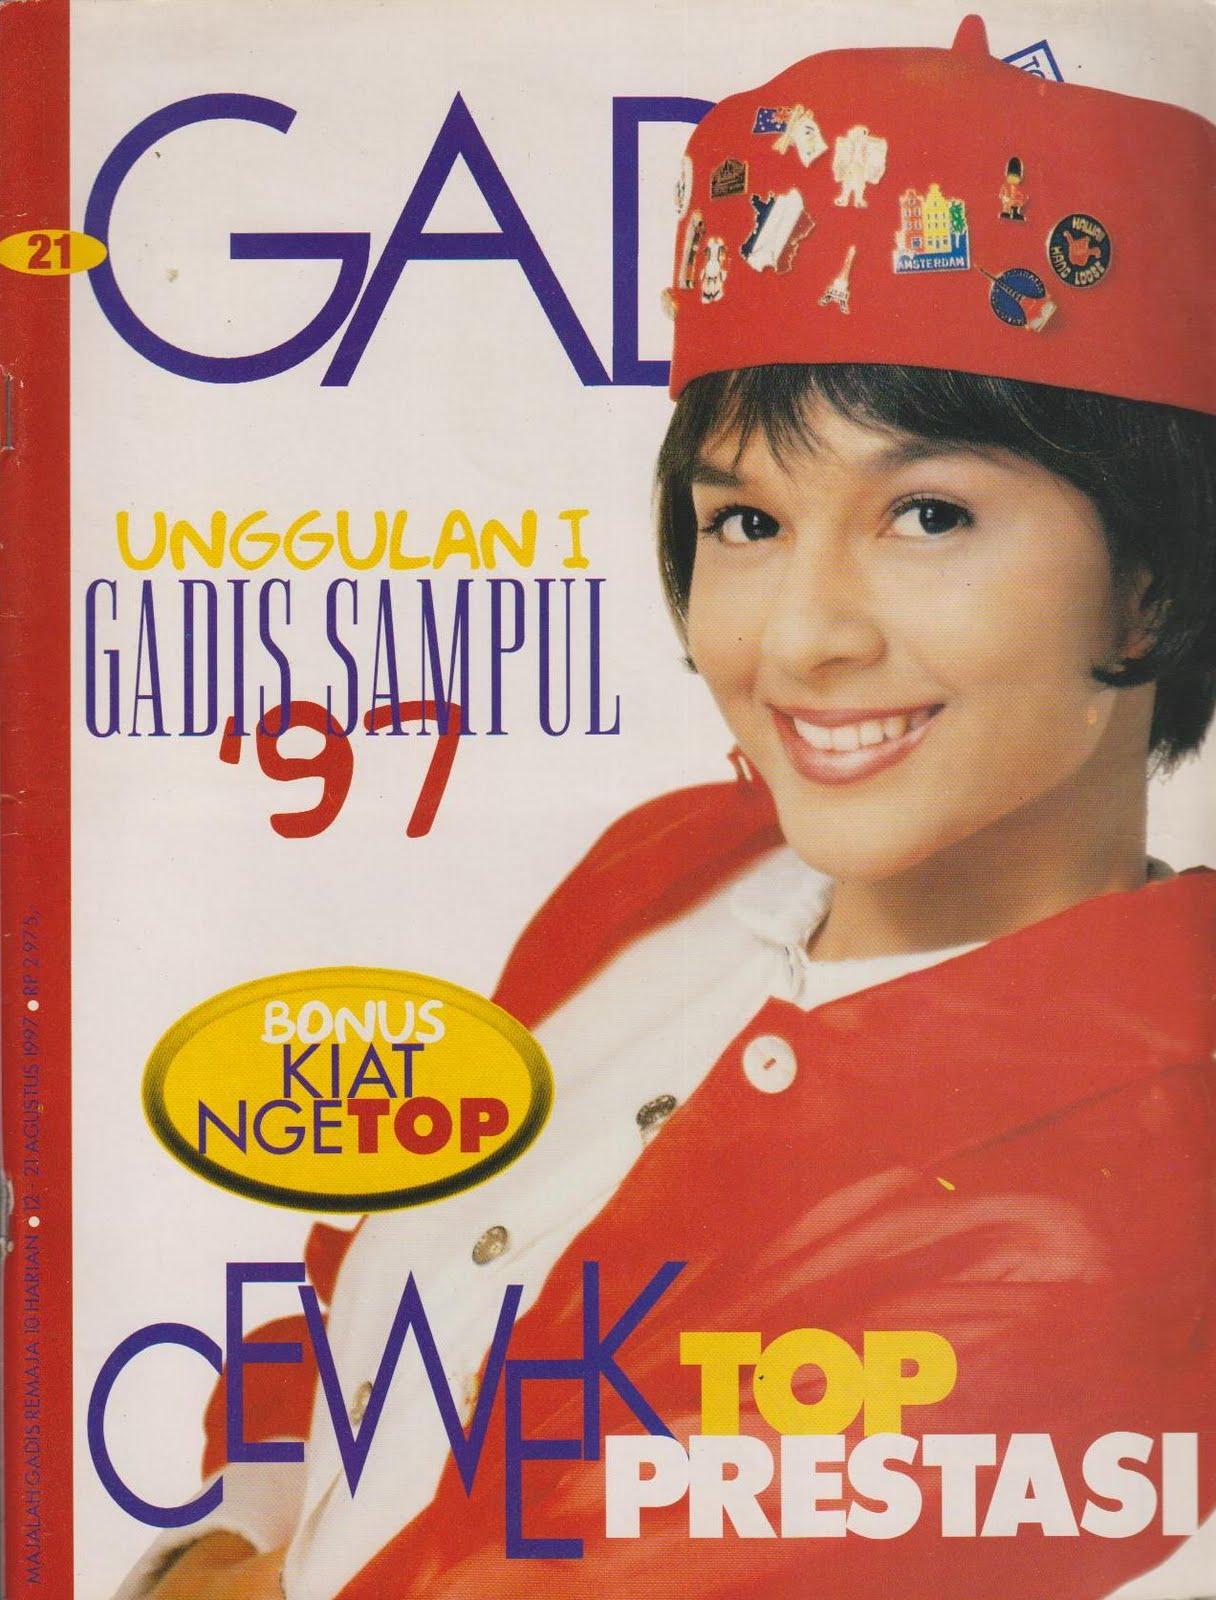 majalah gadis 1997 no 21 model pocut israita gadis sampul 1996